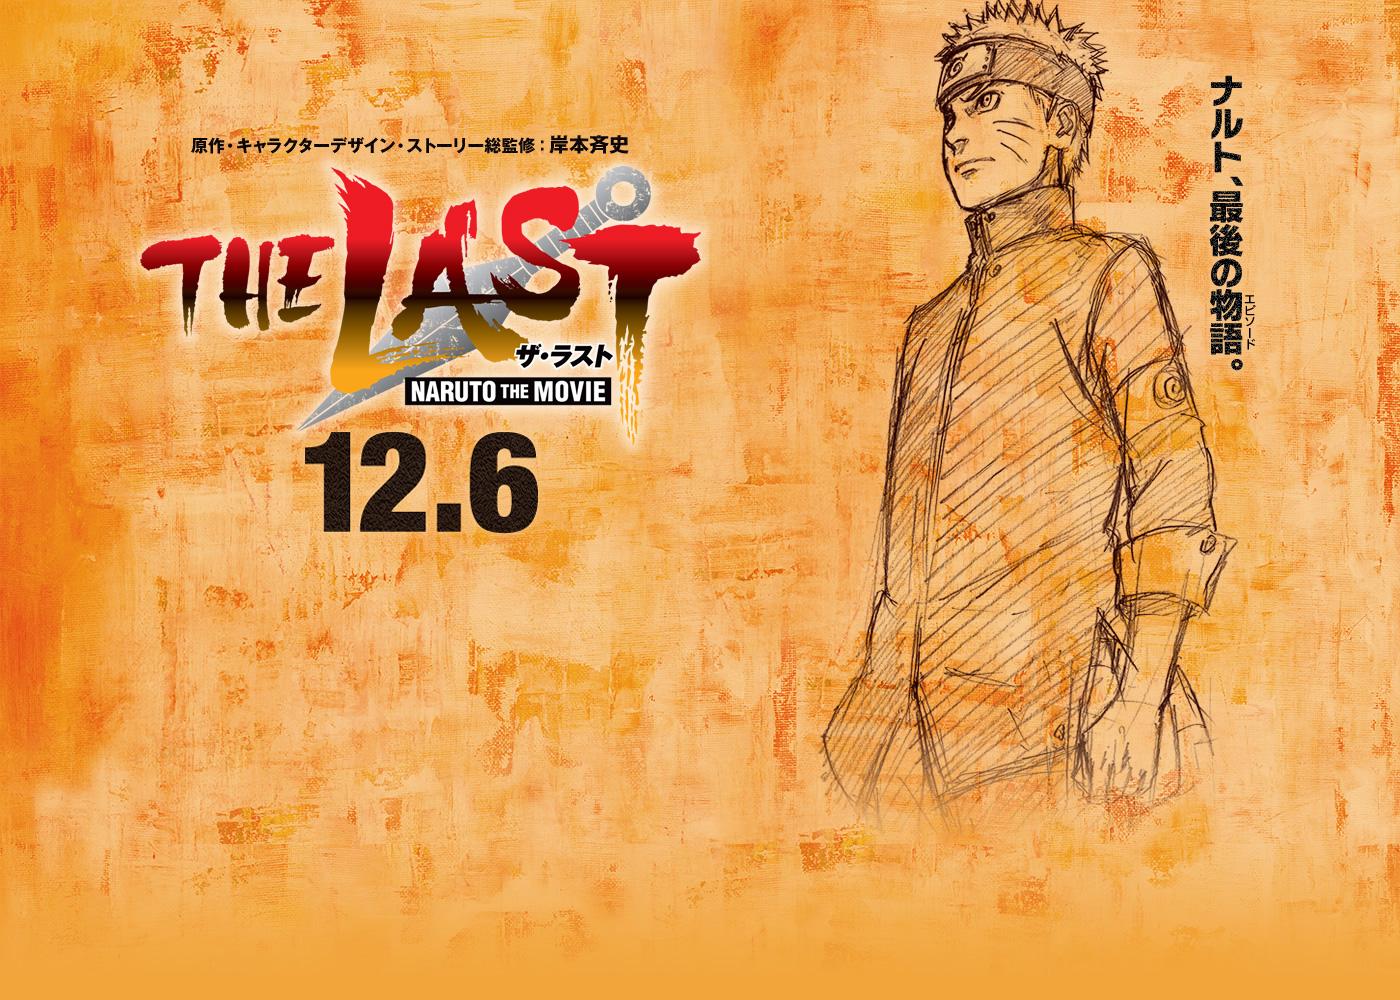 The-Last--Naruto-the-Movie--Website-Visual 2